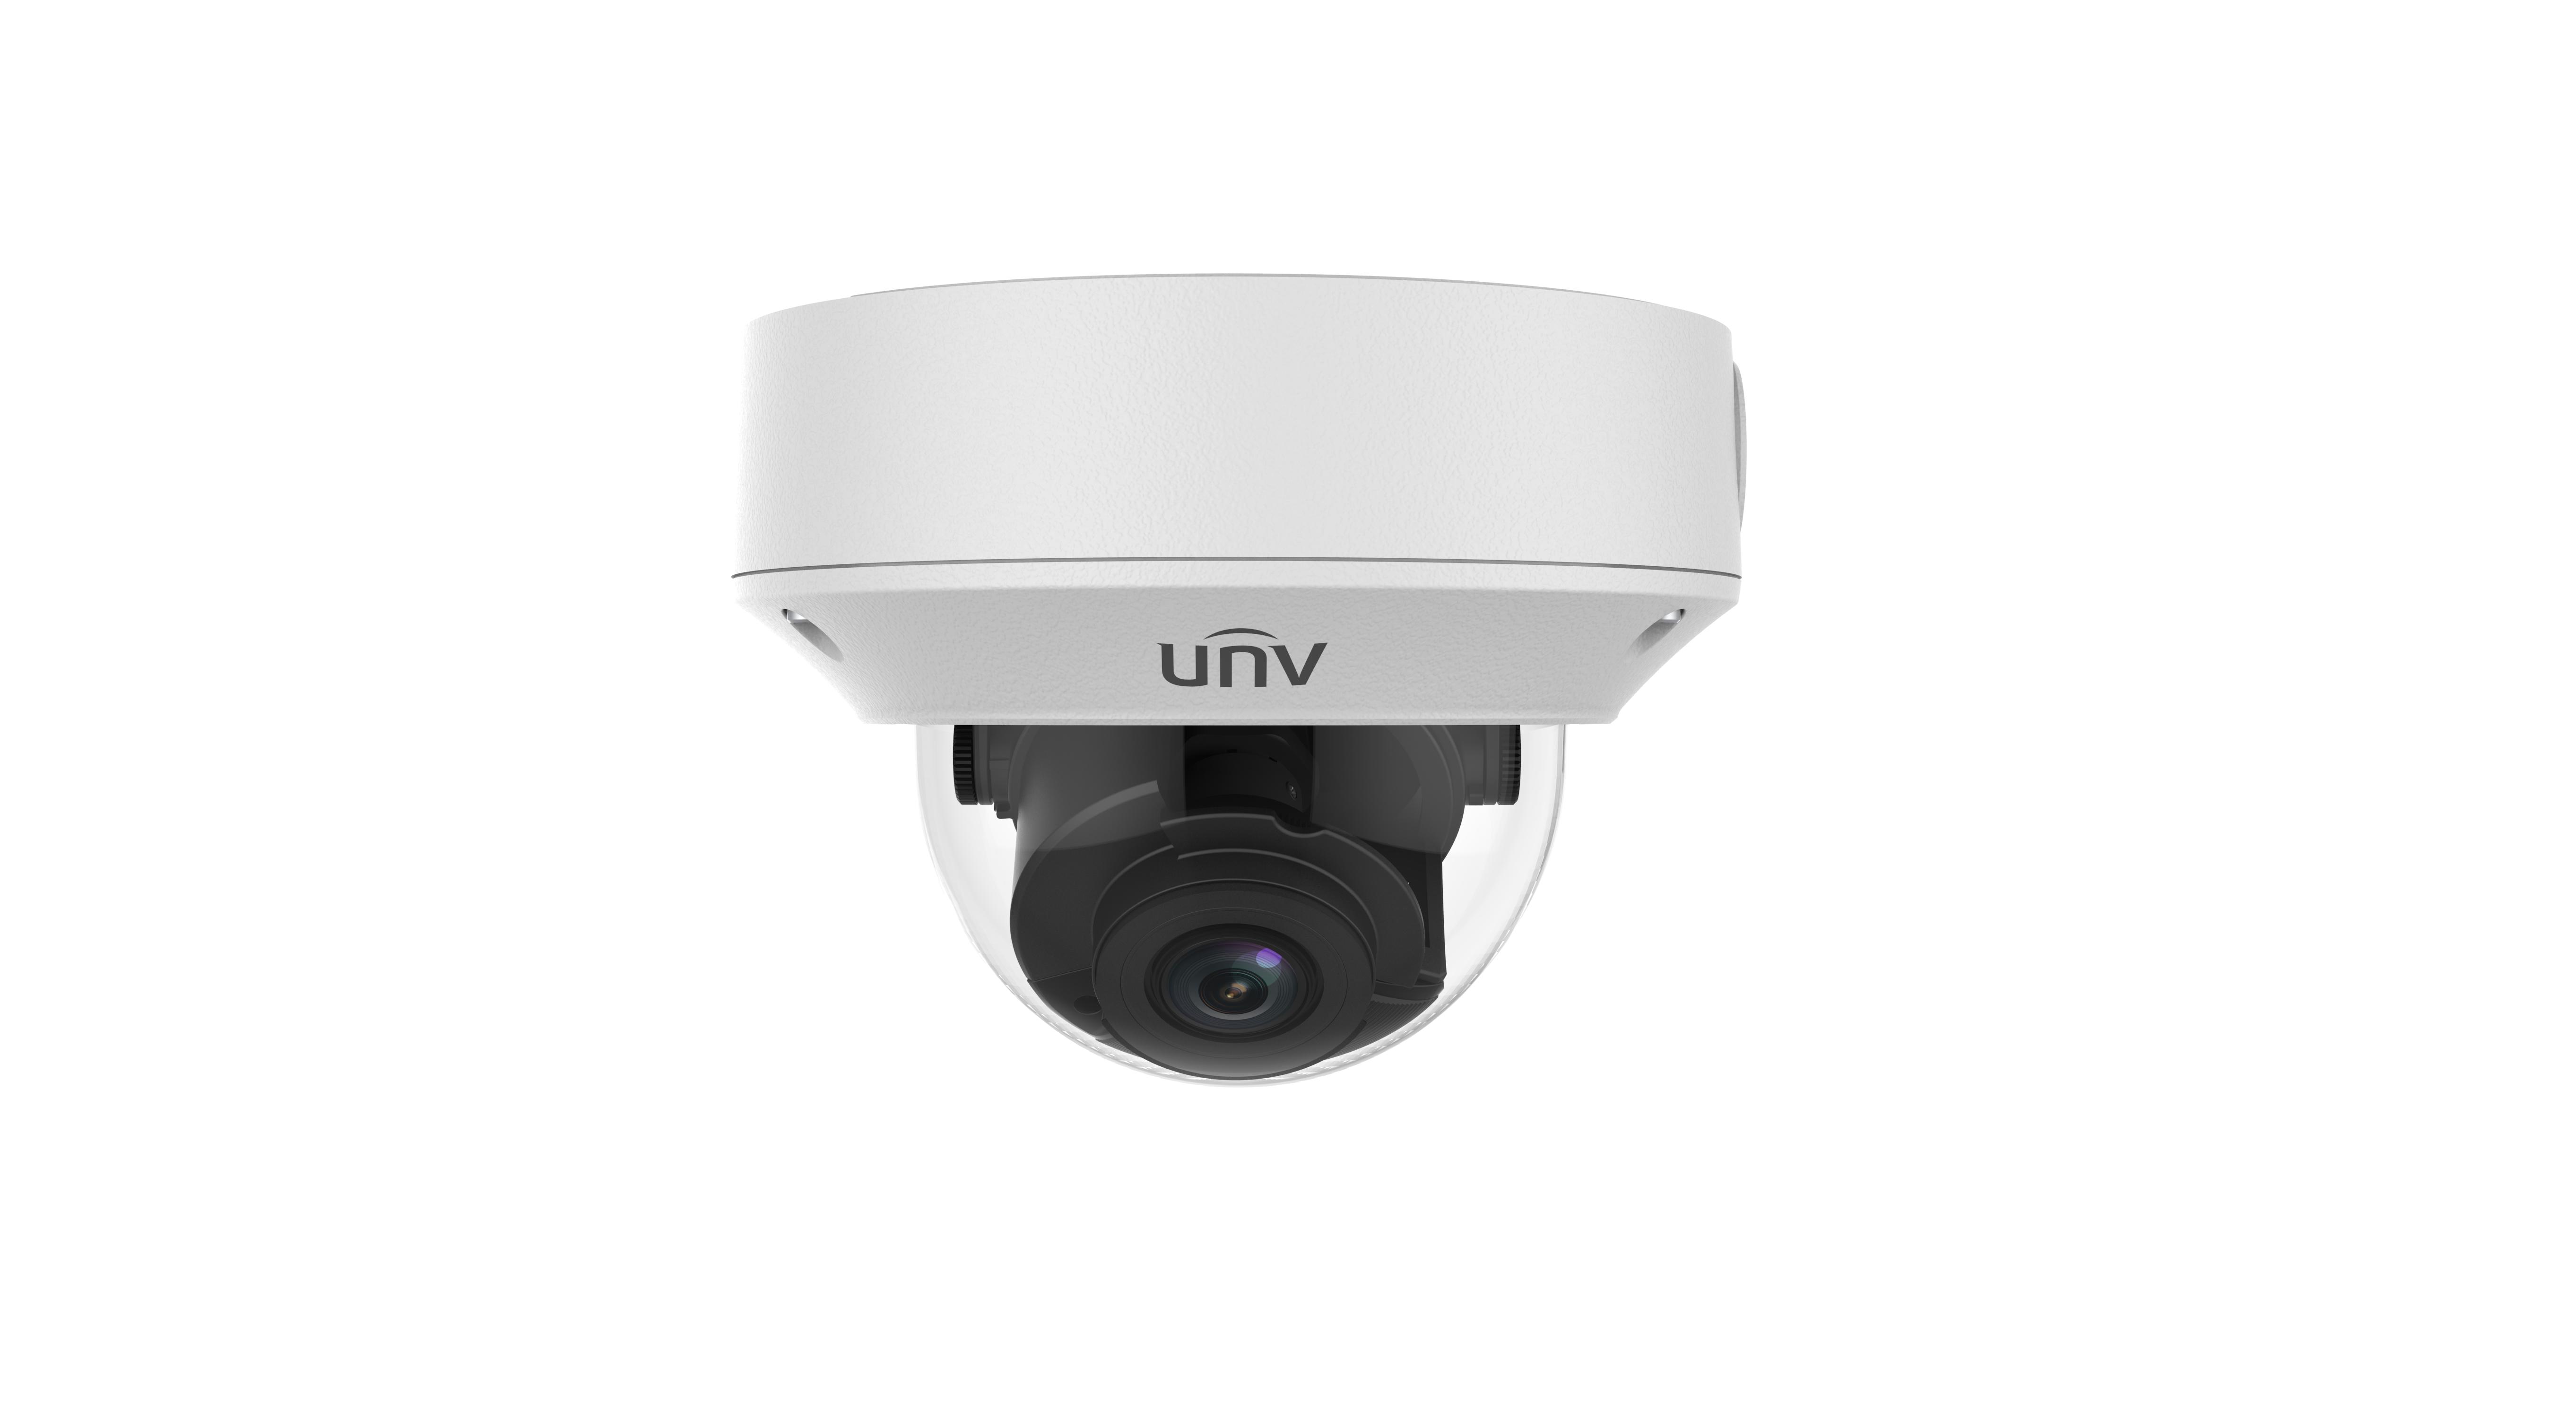 Uniview (Prime) 5MP IP Ultra H.265 2.7~13.5mm Motorised 30m Starlight IR IK10 Dome Camera